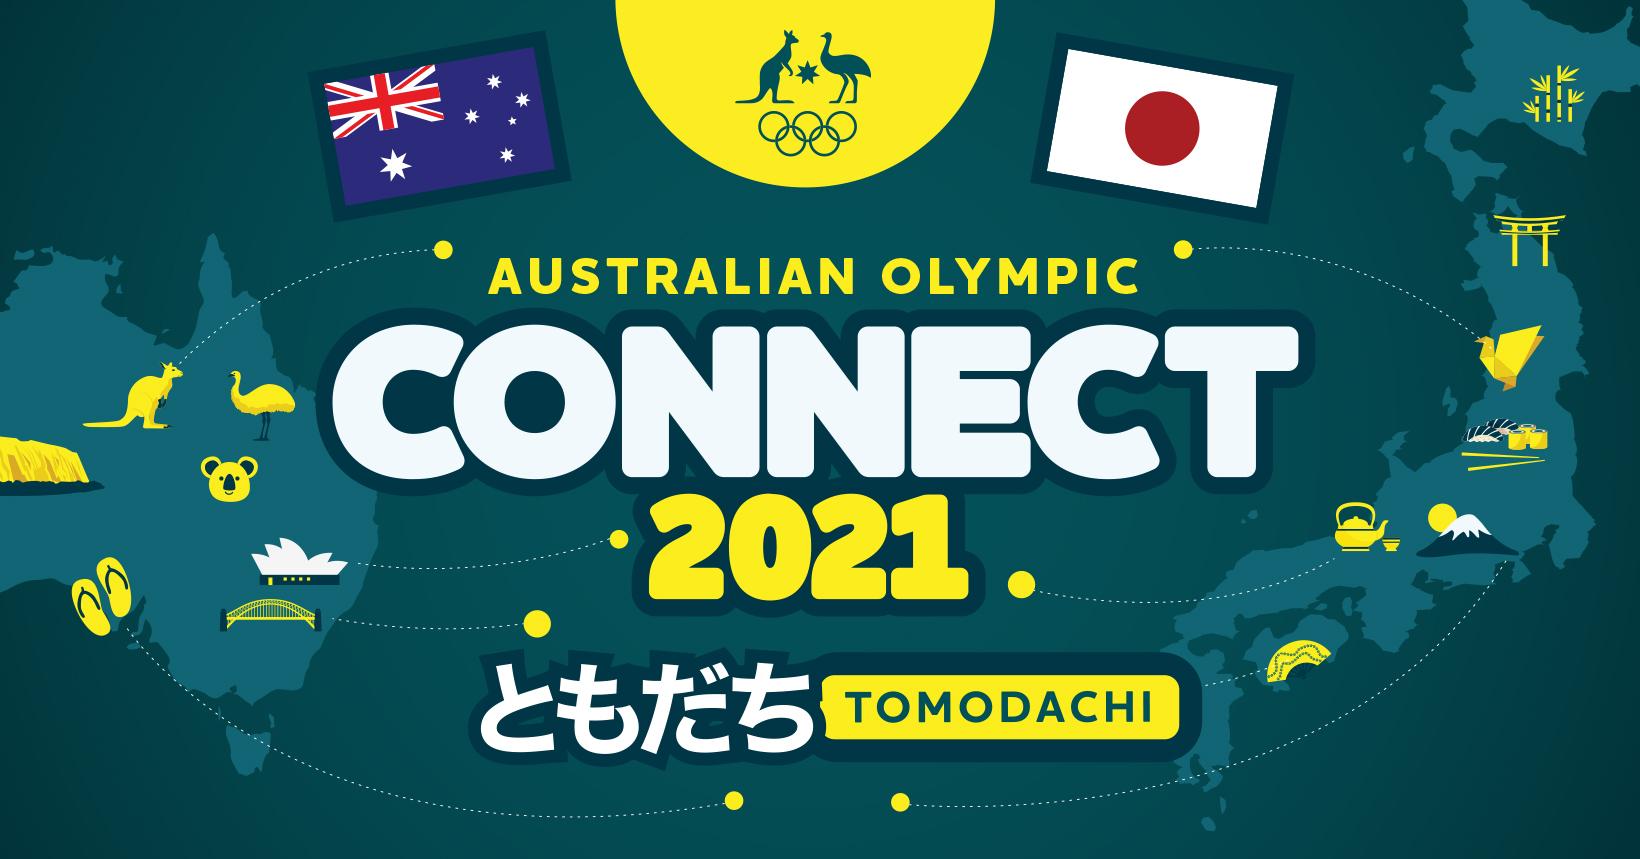 Australian Olympic Connect 2021